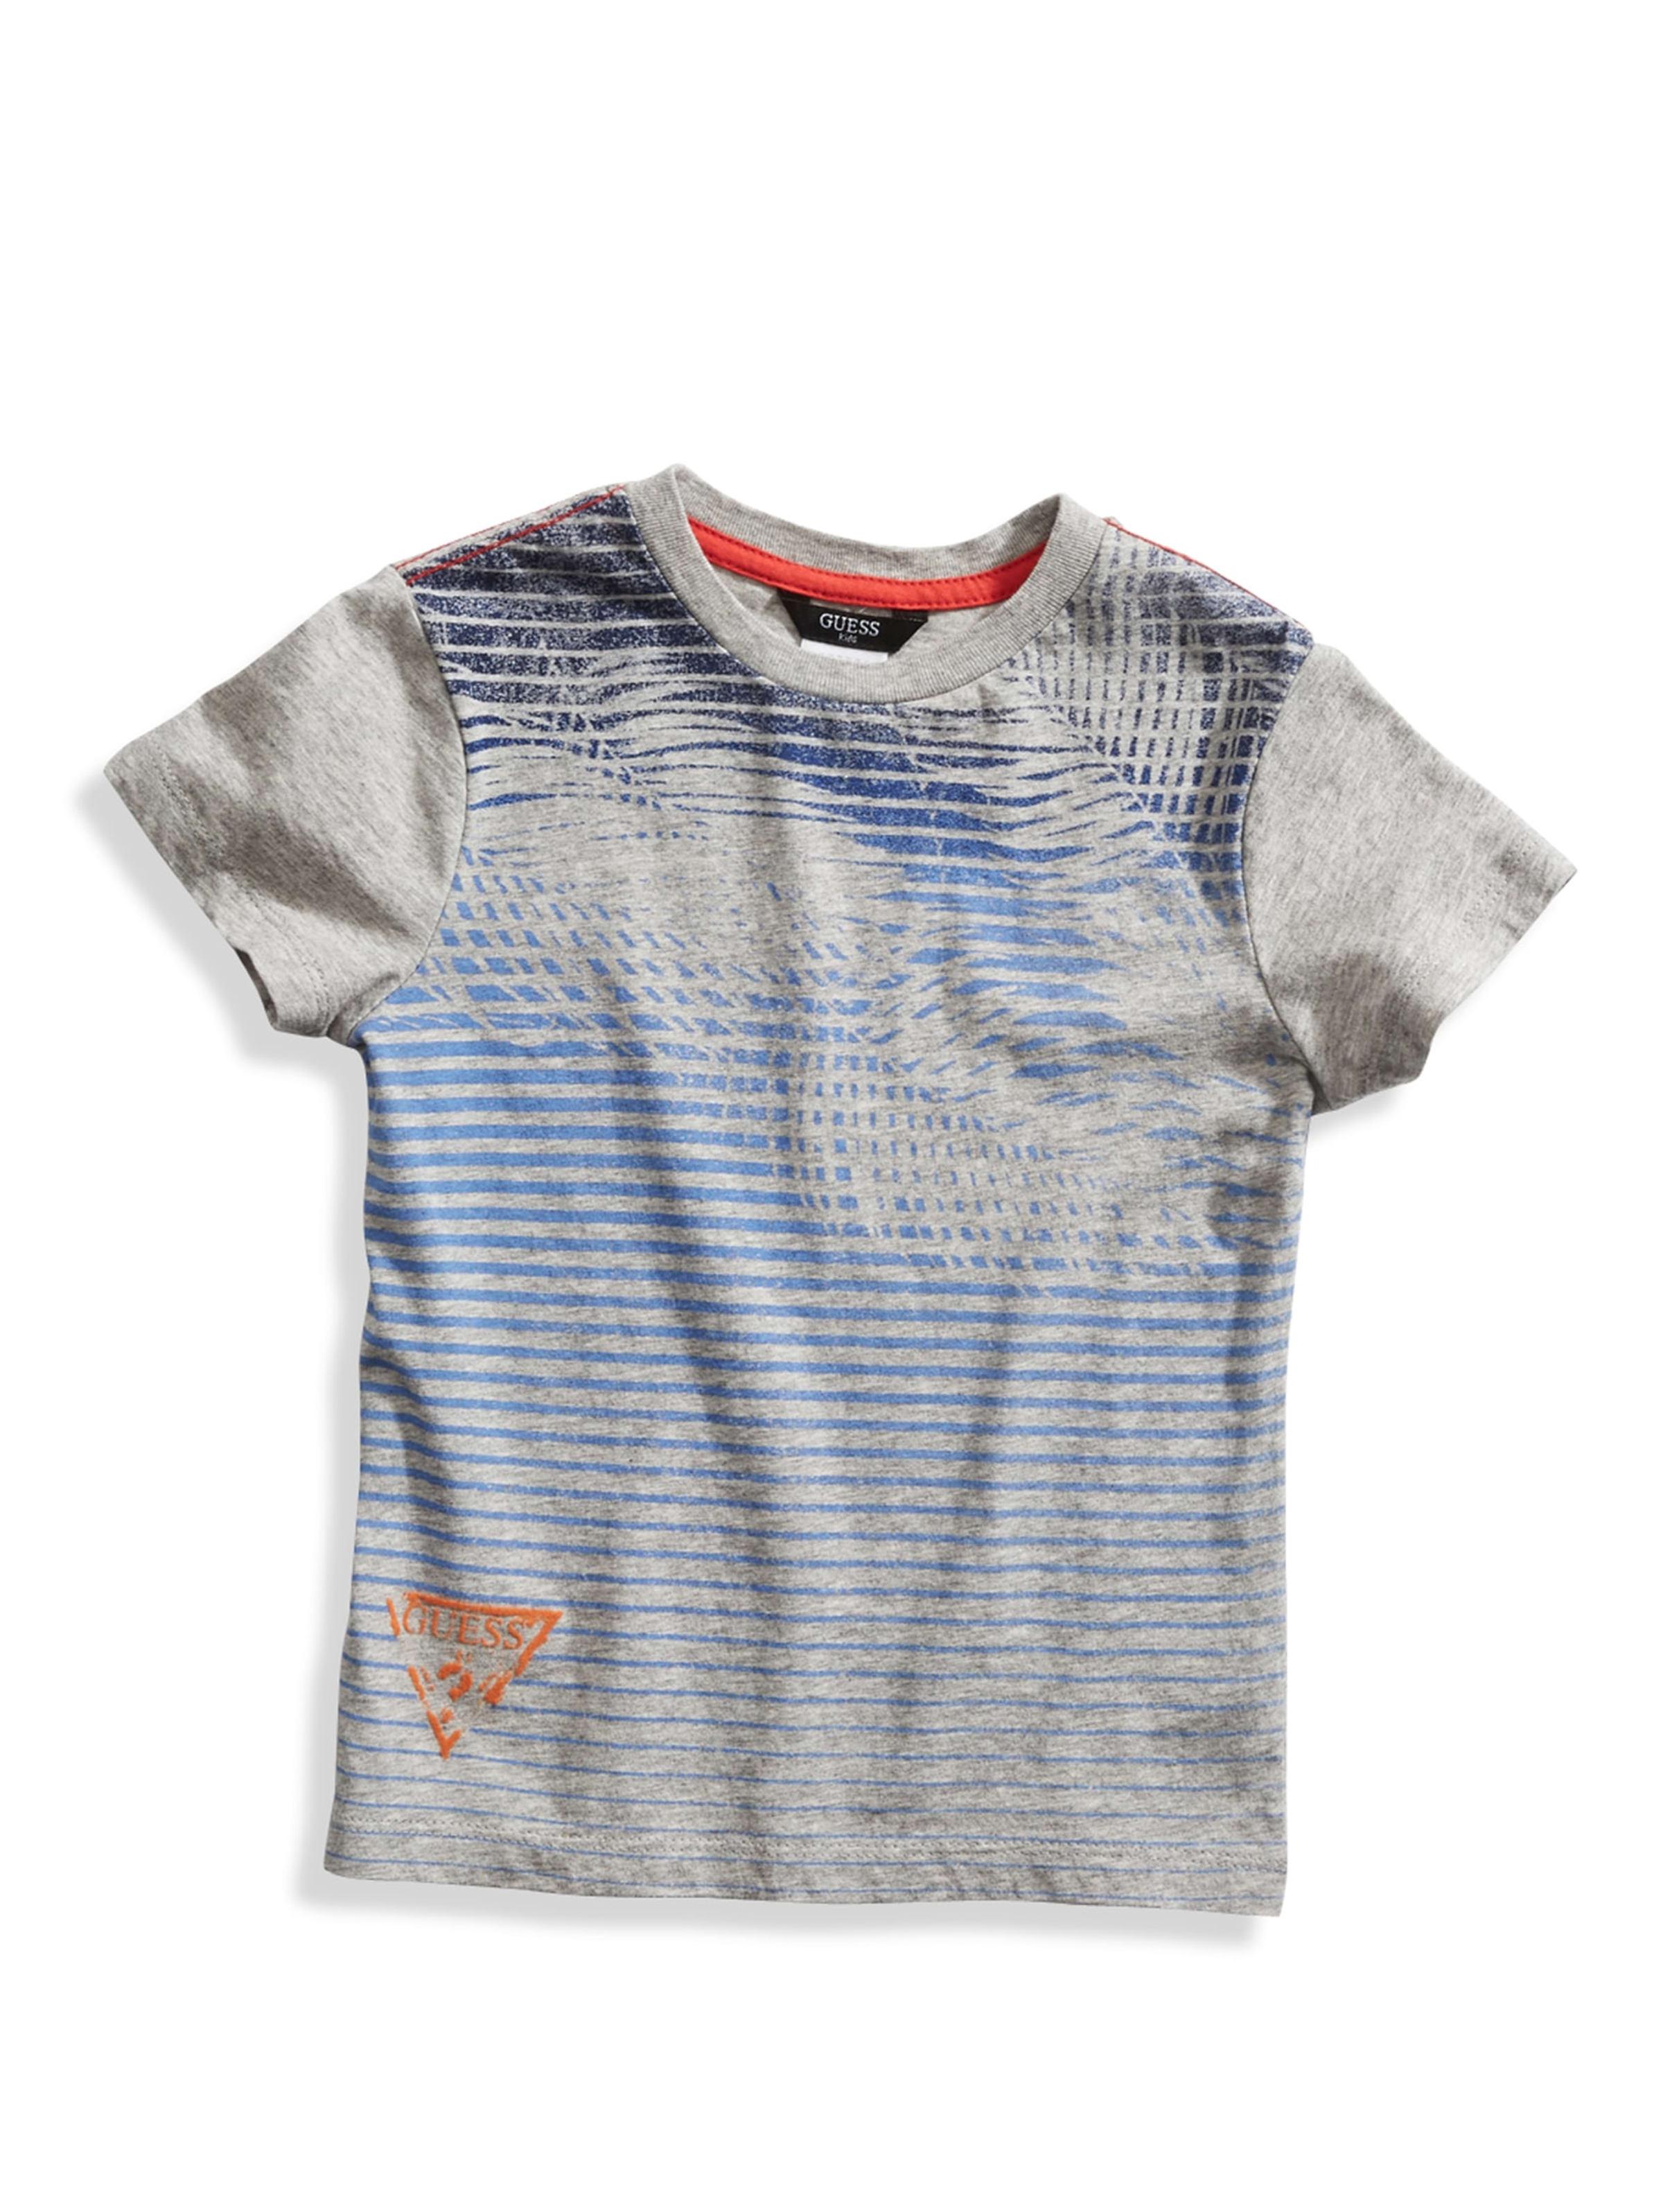 Guess Little Boys 2T 7 Short Sleeve Striped Tee